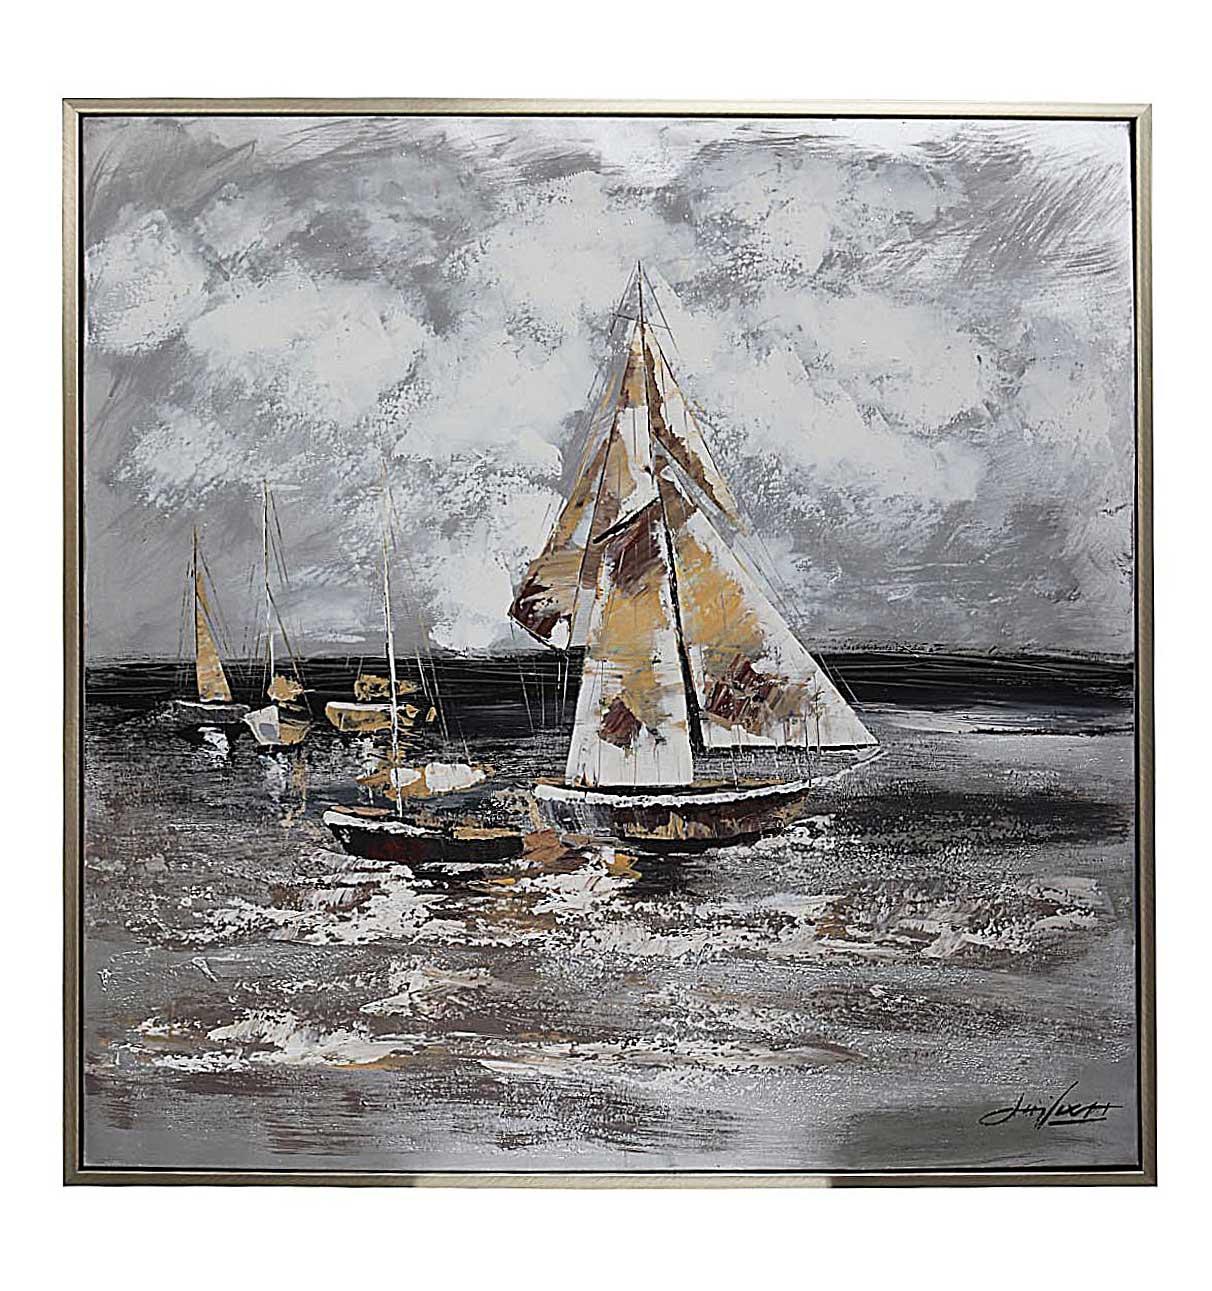 Original Gemälde Schiffe Segelschiff Meer Öl auf Leinwand Rahmen ...